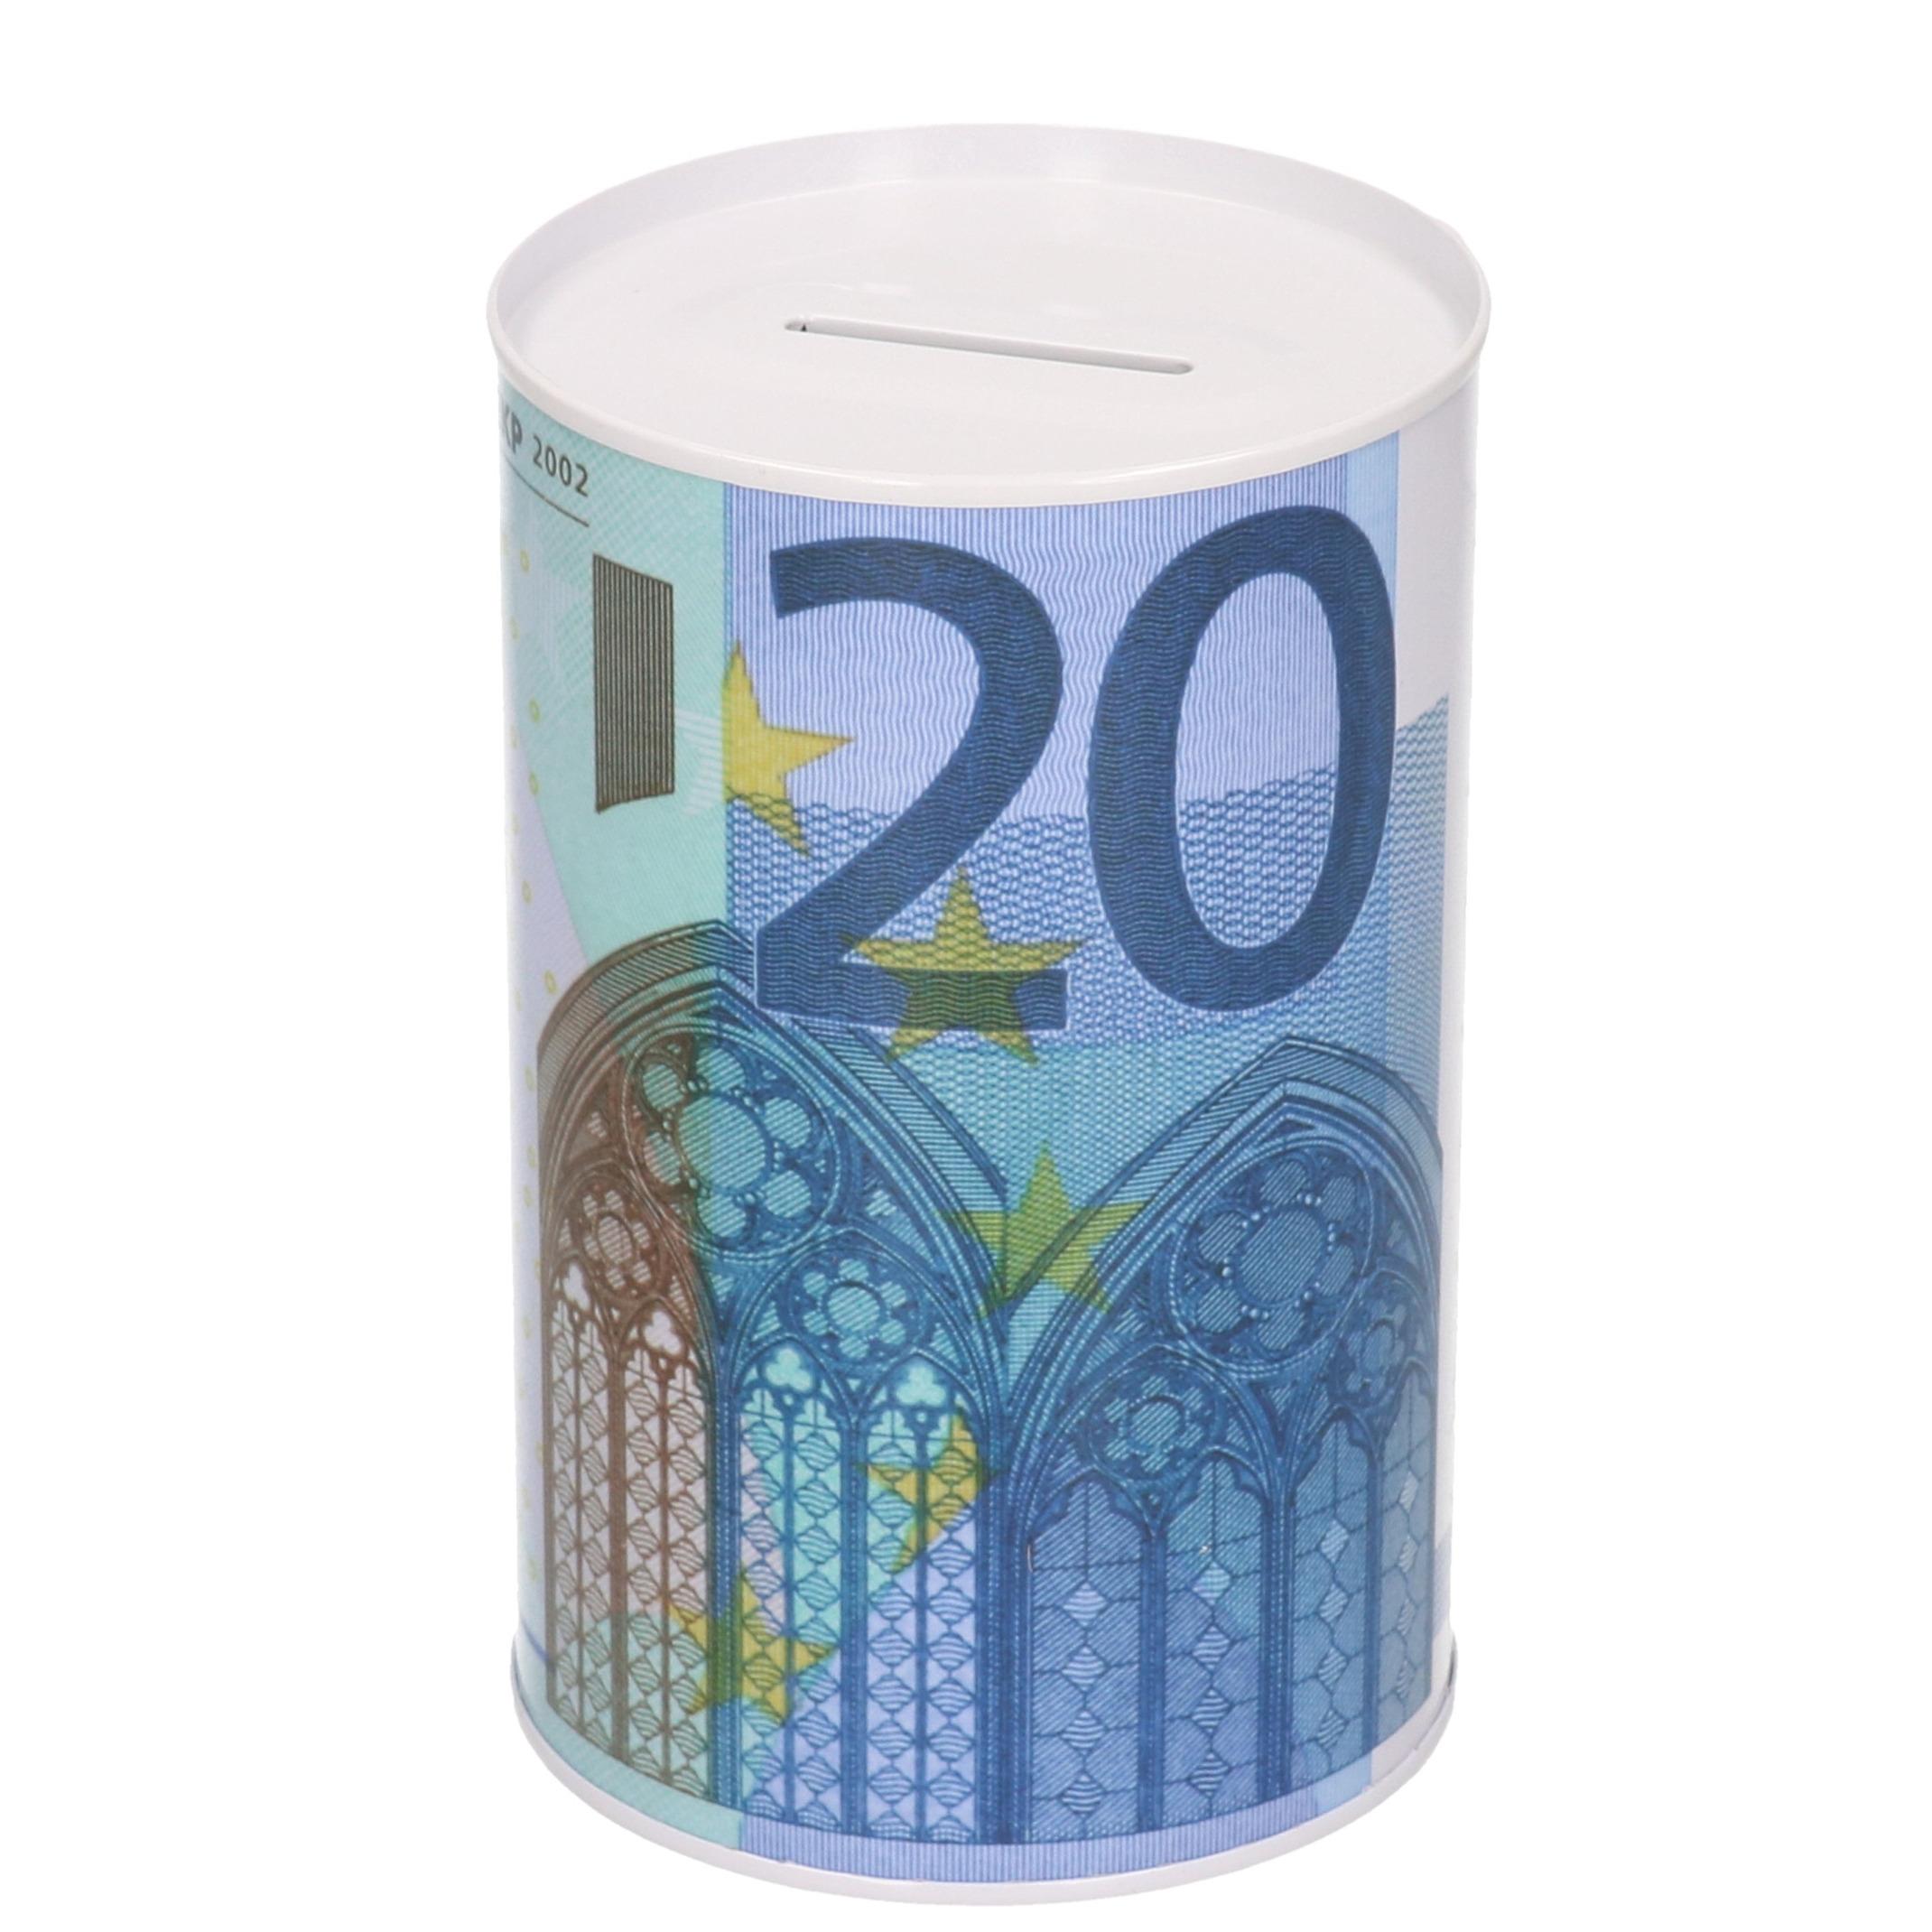 Spaarpot blik 20 euro biljet 8 x 15 cm